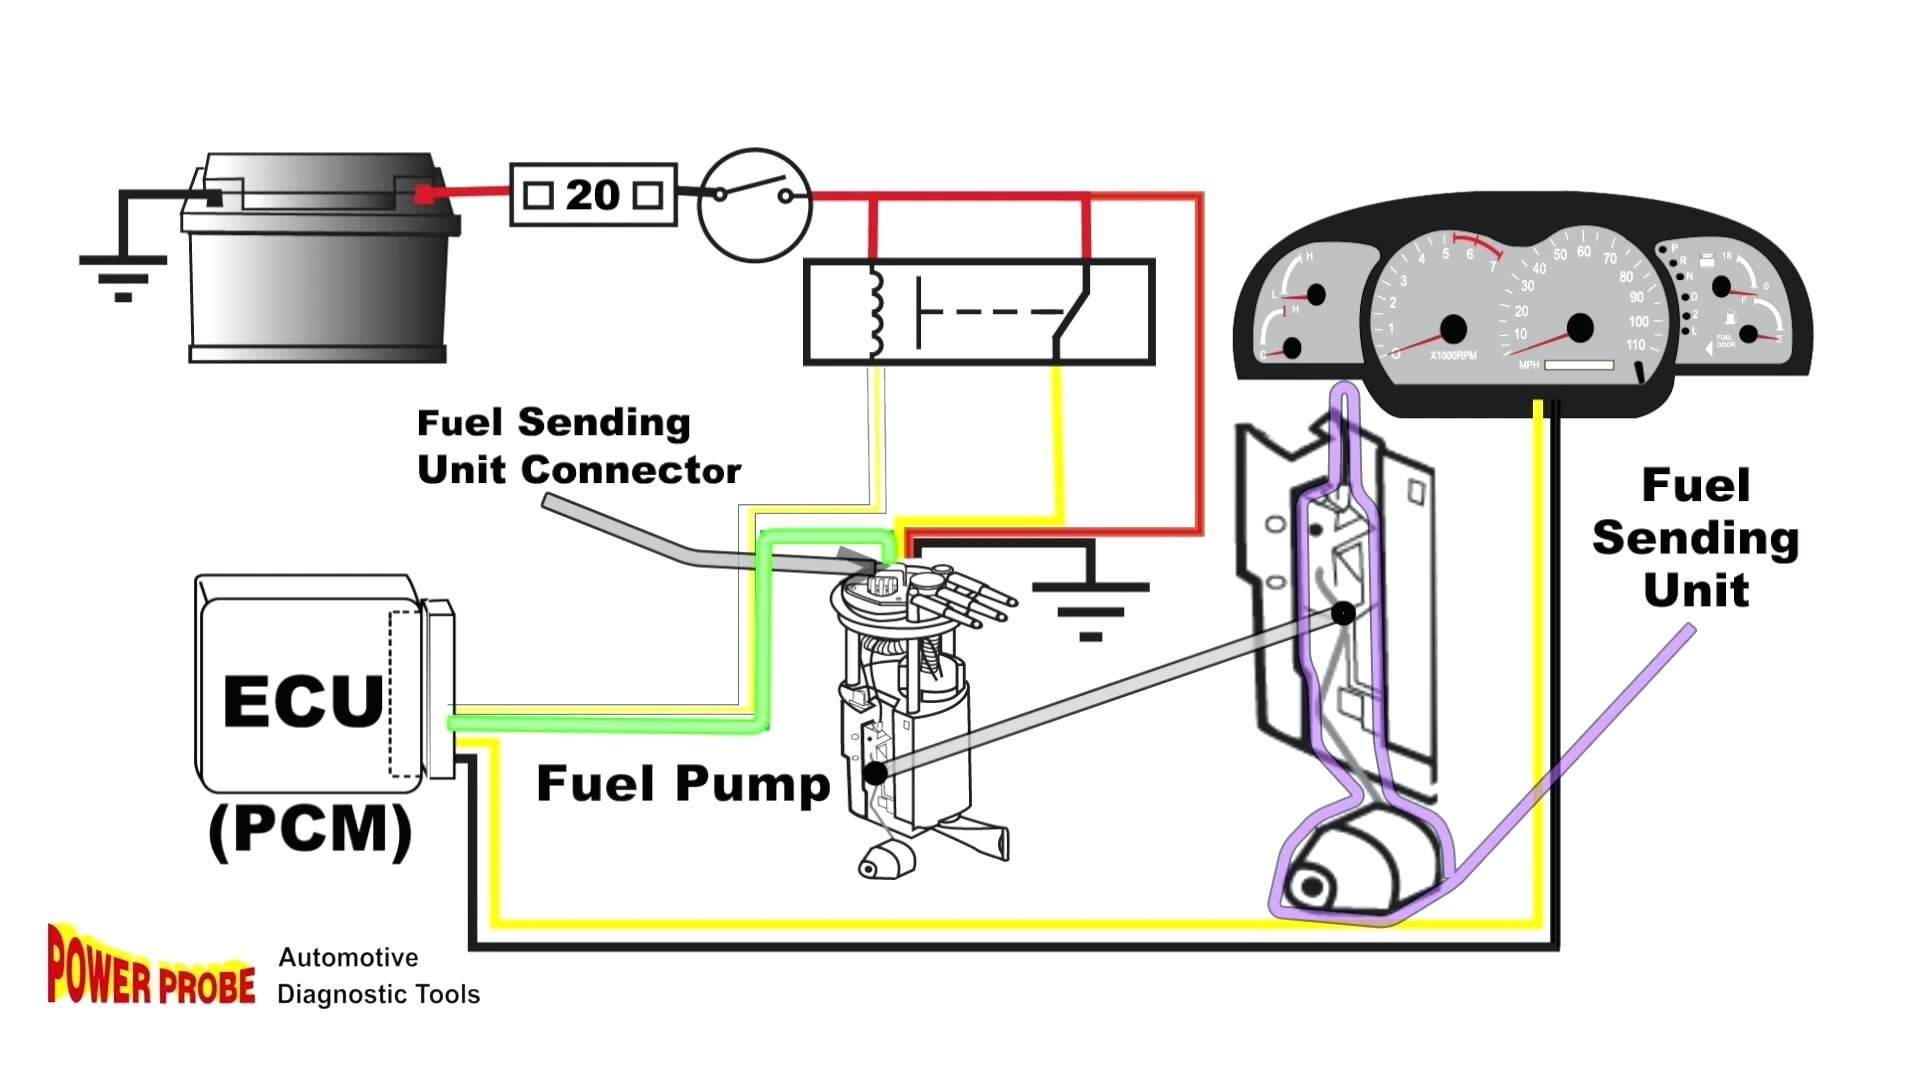 Wiring Diagram 3 Way Switch Multiple Lights Marine Fuel Gauge Stuning Boat Sending